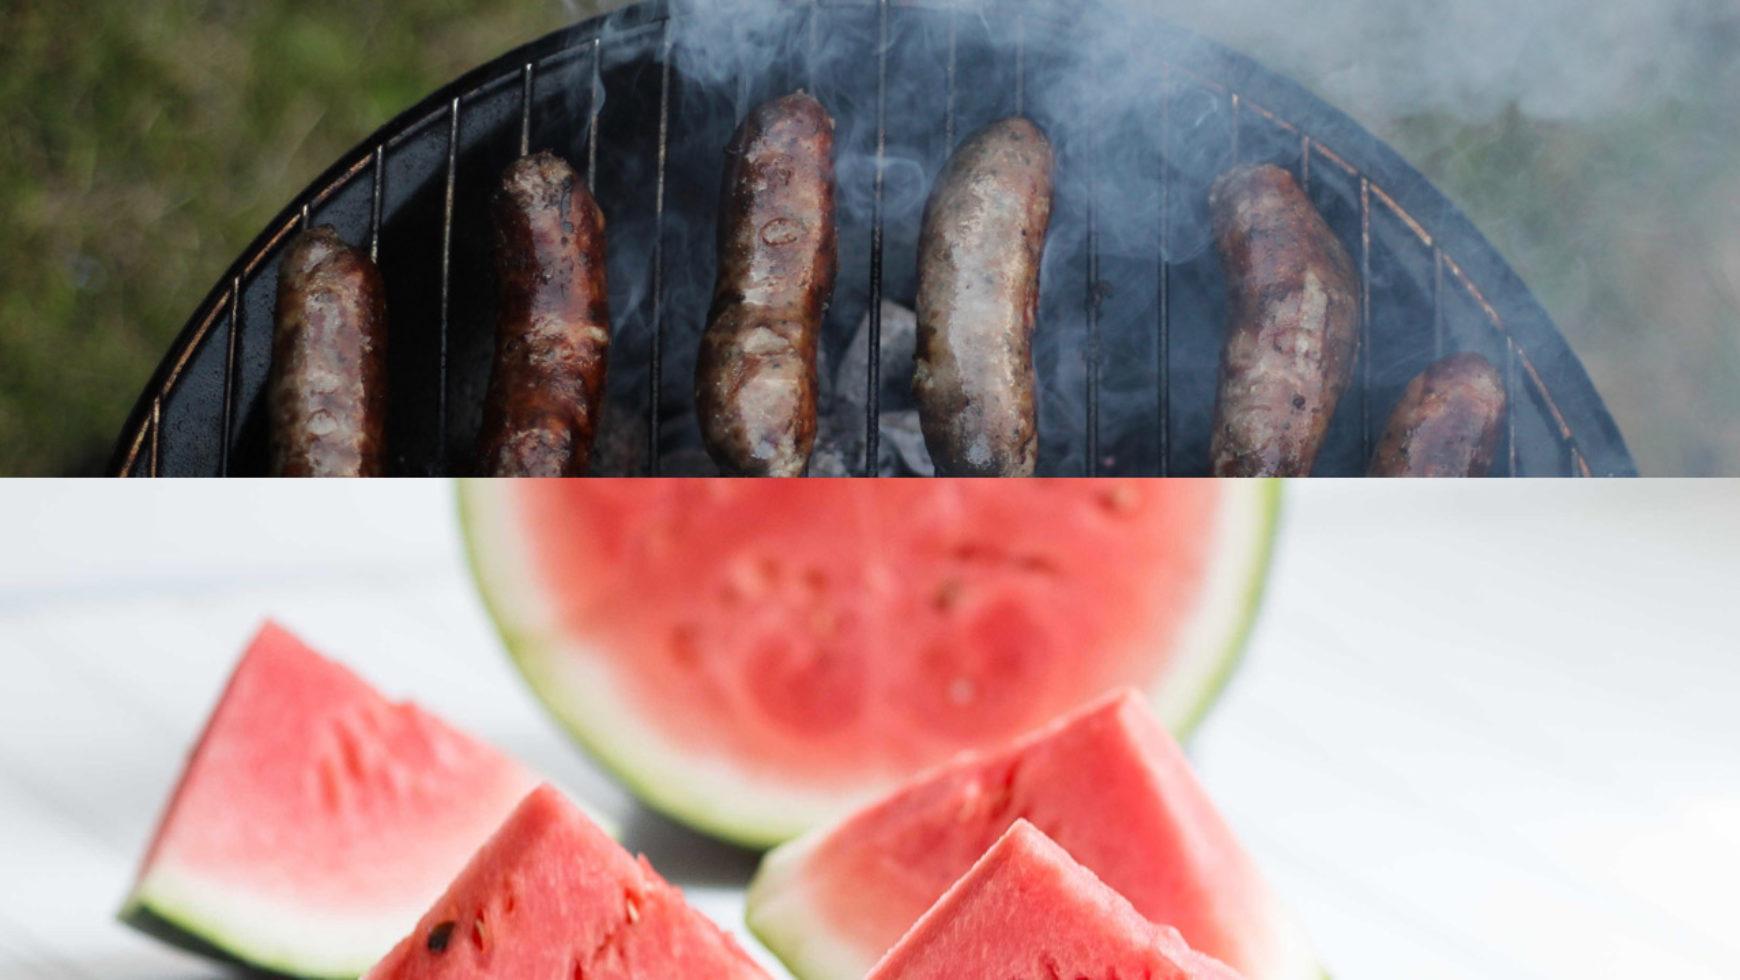 Hot Dog & Watermelon Lunch